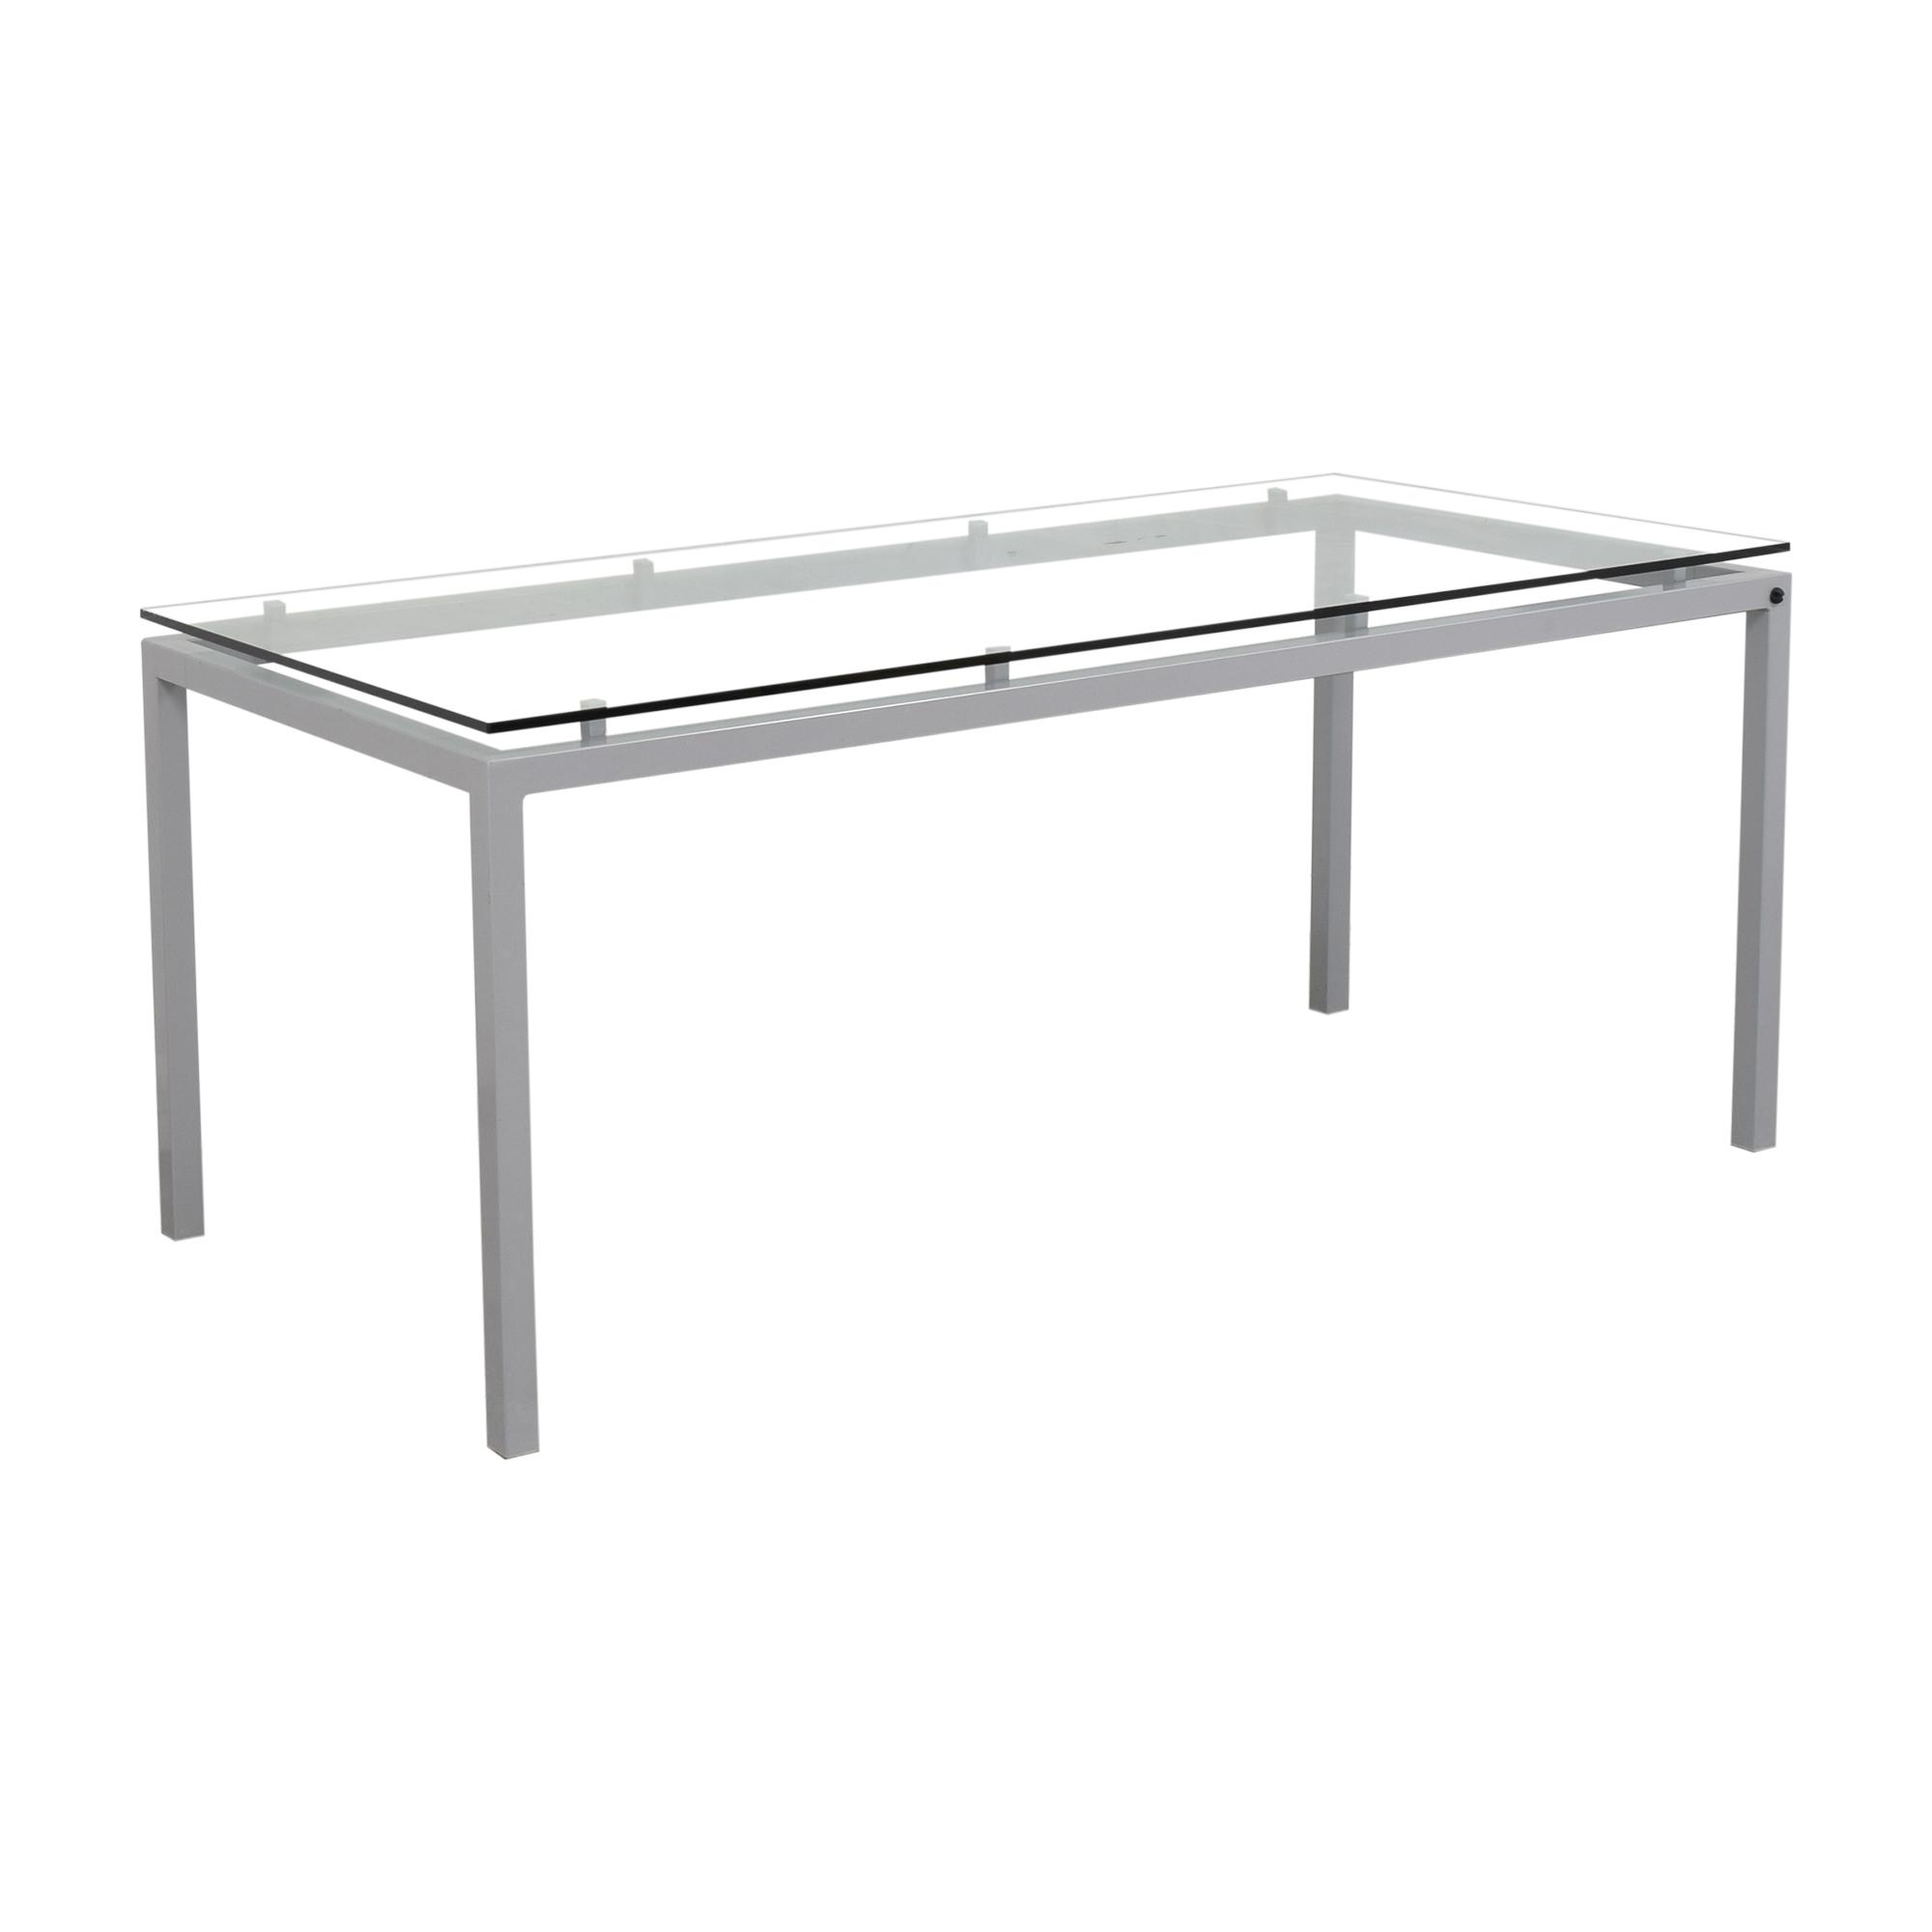 shop Design Within Reach Tavola Table Design Within Reach